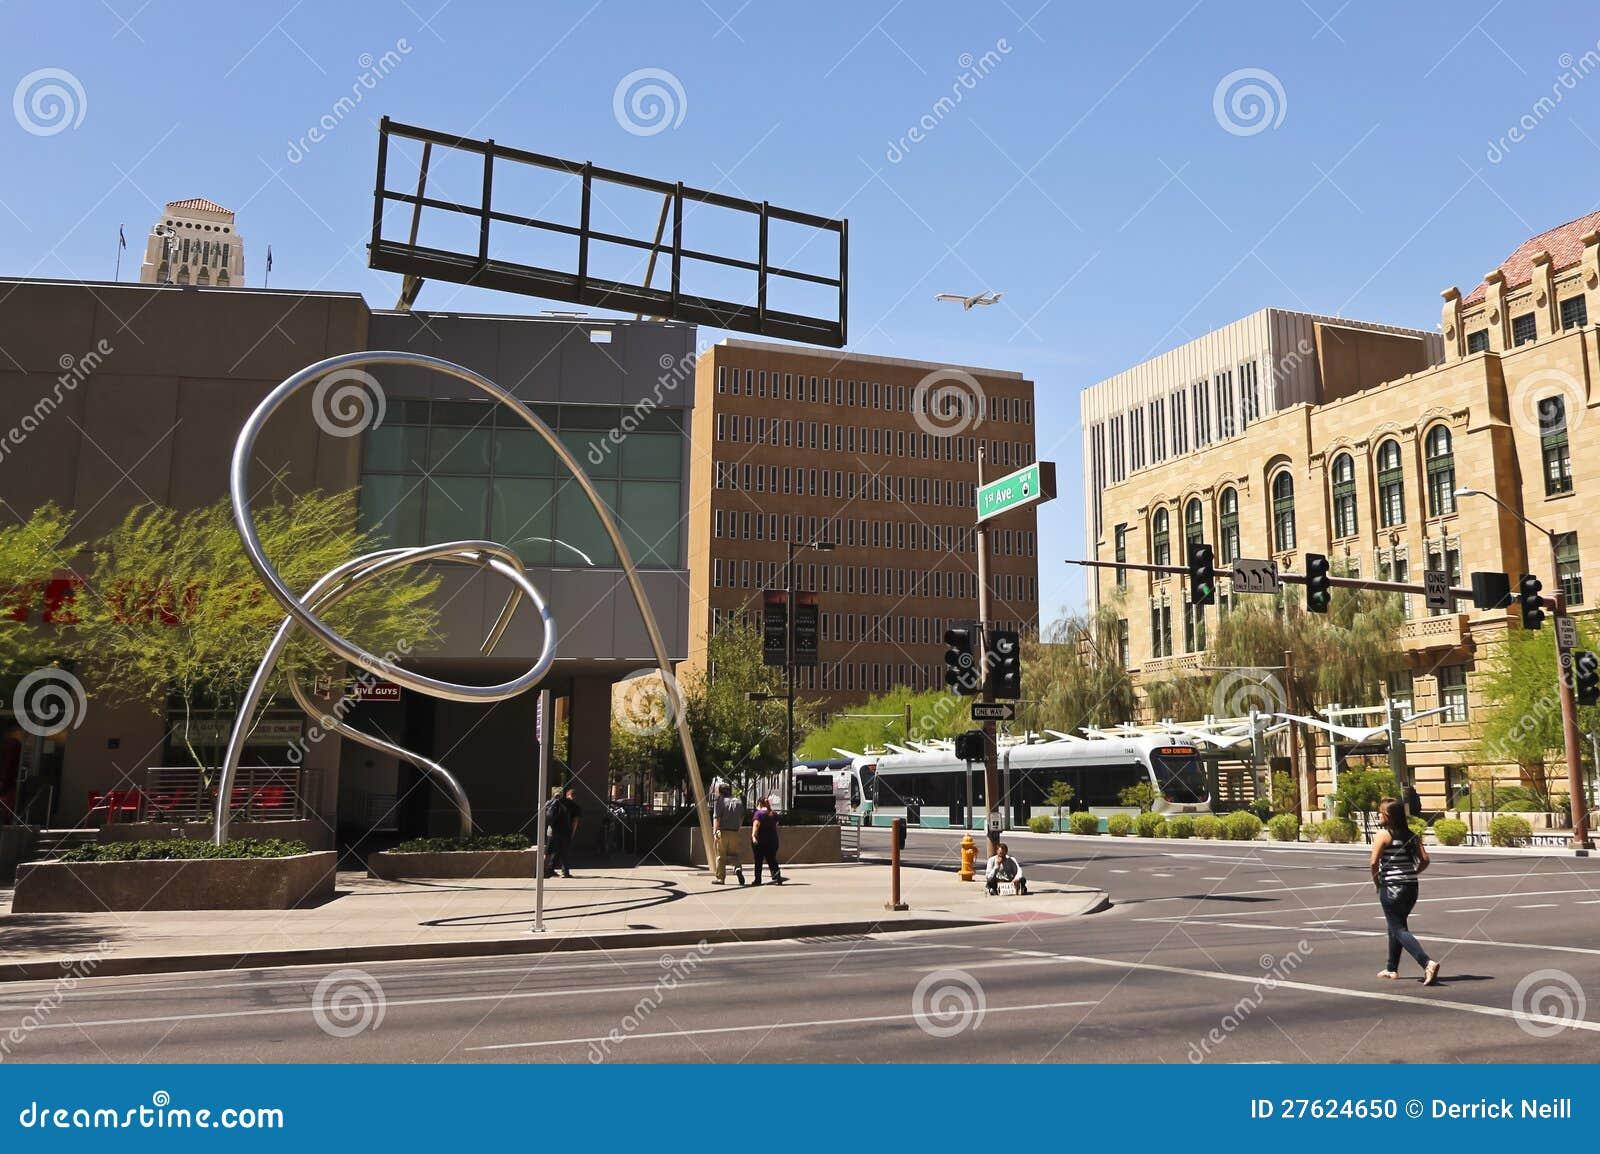 Phenix City (AL) United States  City pictures : phoenix arizona june 13 washington and 1st on june 13 2012 in phoenix ...